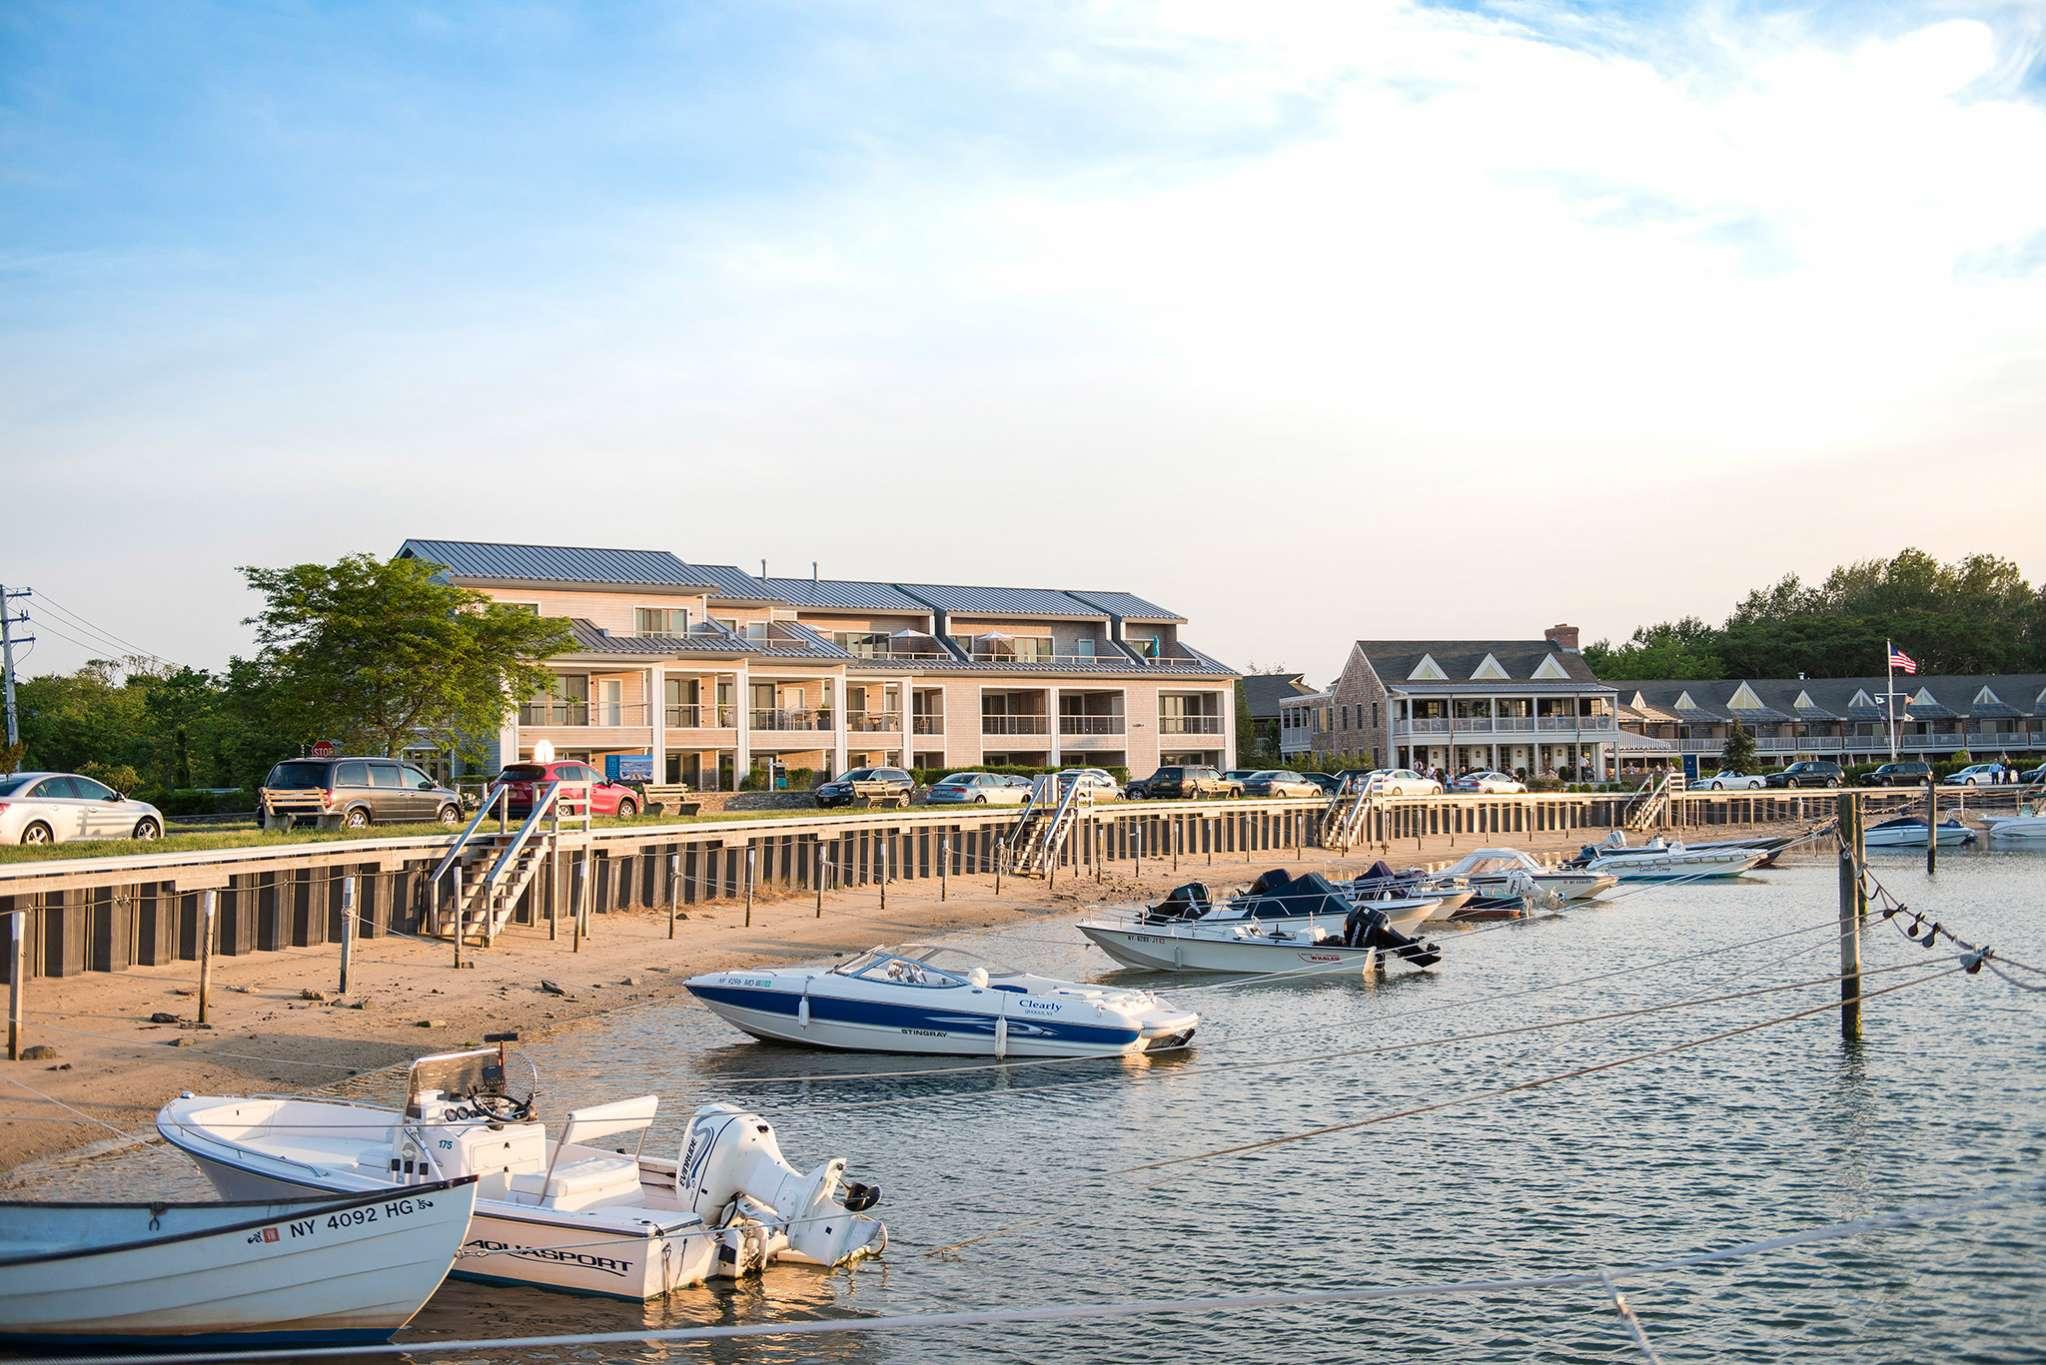 Condominium for Sale at Harbor's Edge - Resort Lifestyle In Sag Harbor 21 West Water Street, 1e, Sag Harbor, New York